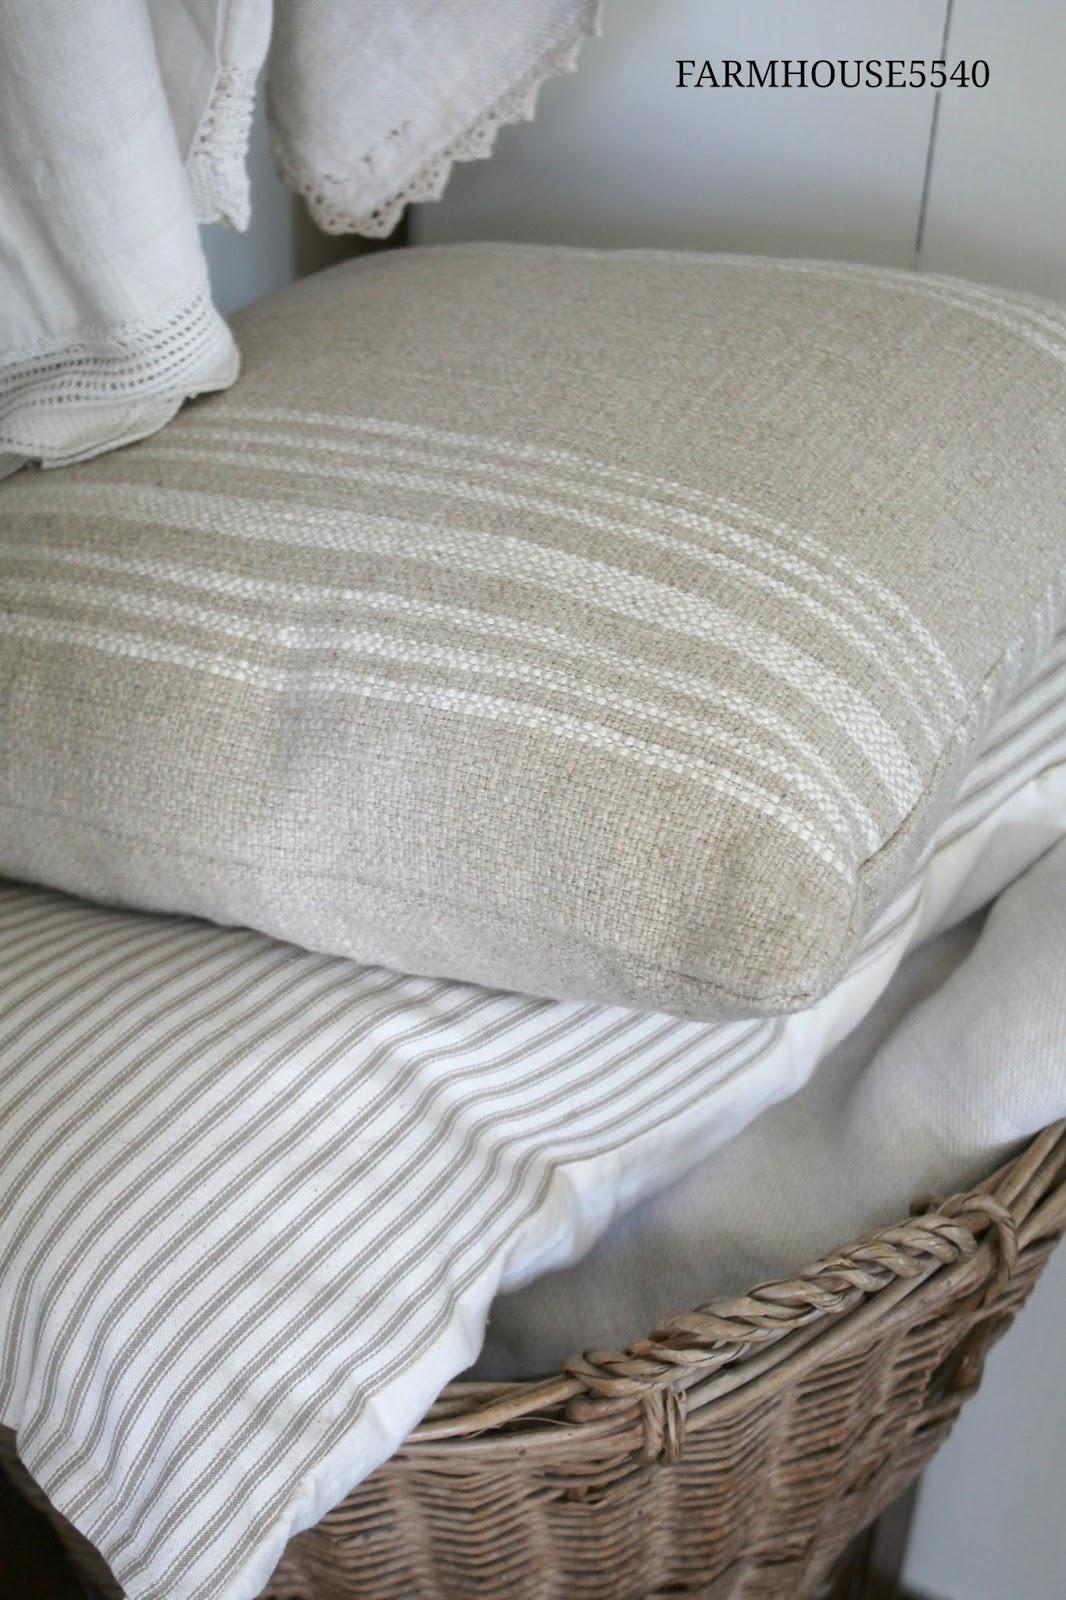 Farmhouse 5540 Weekly Inspiration Pillows